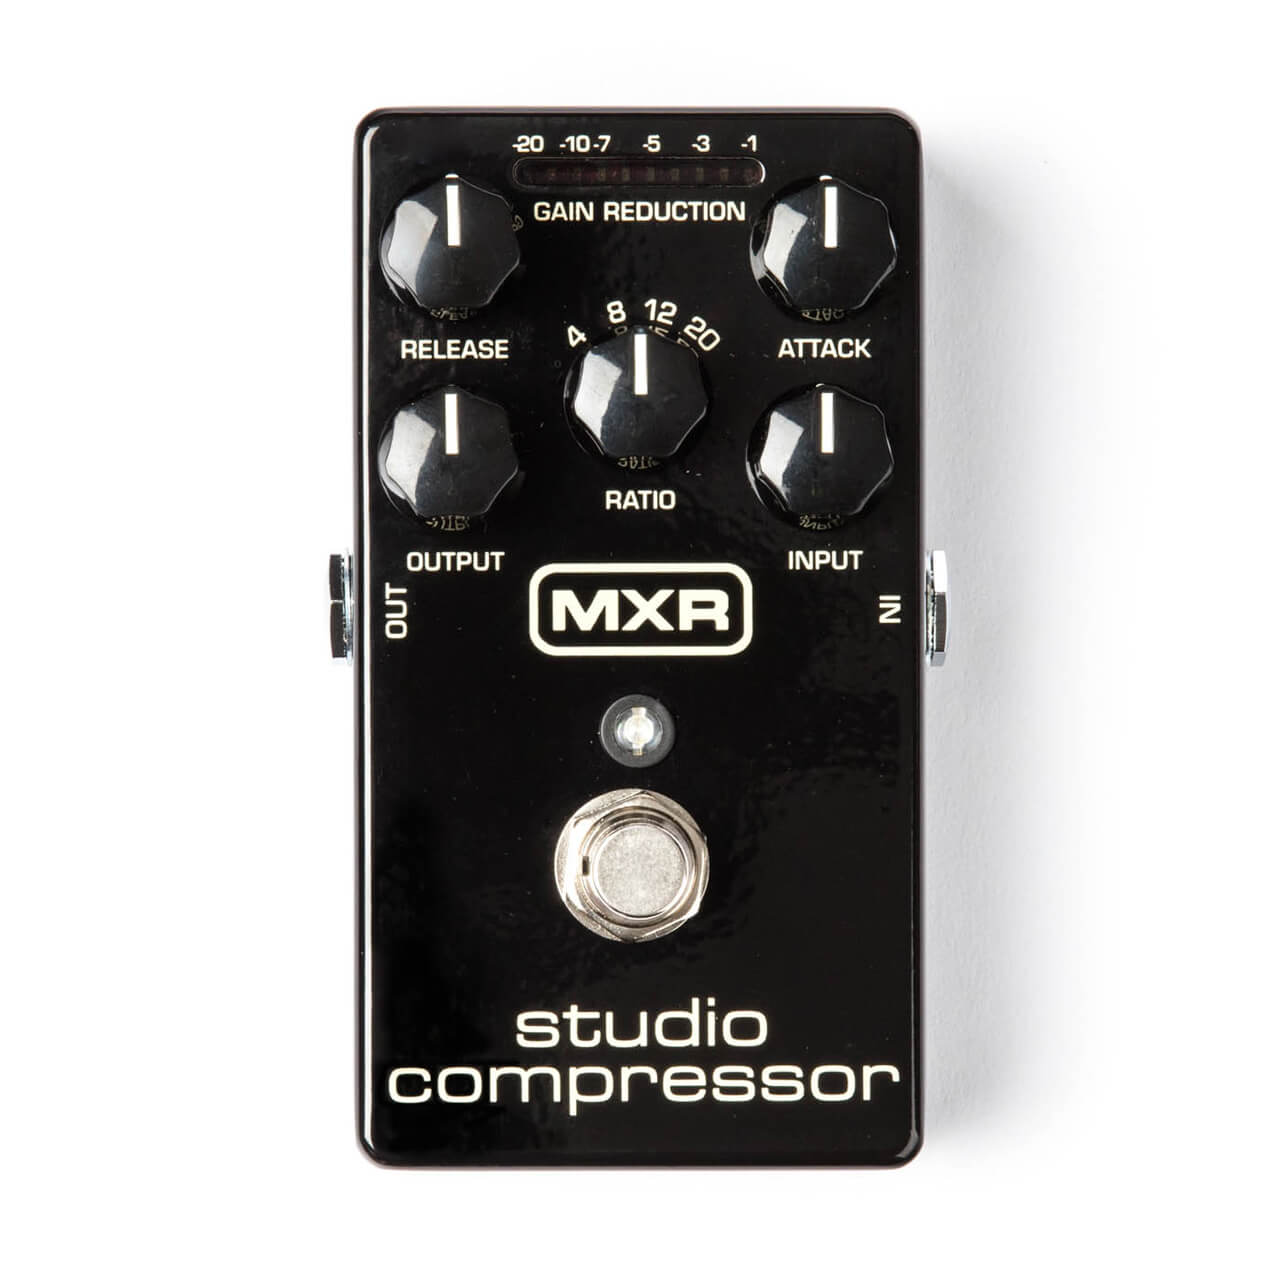 Pedal MXR Studio Compressor M76